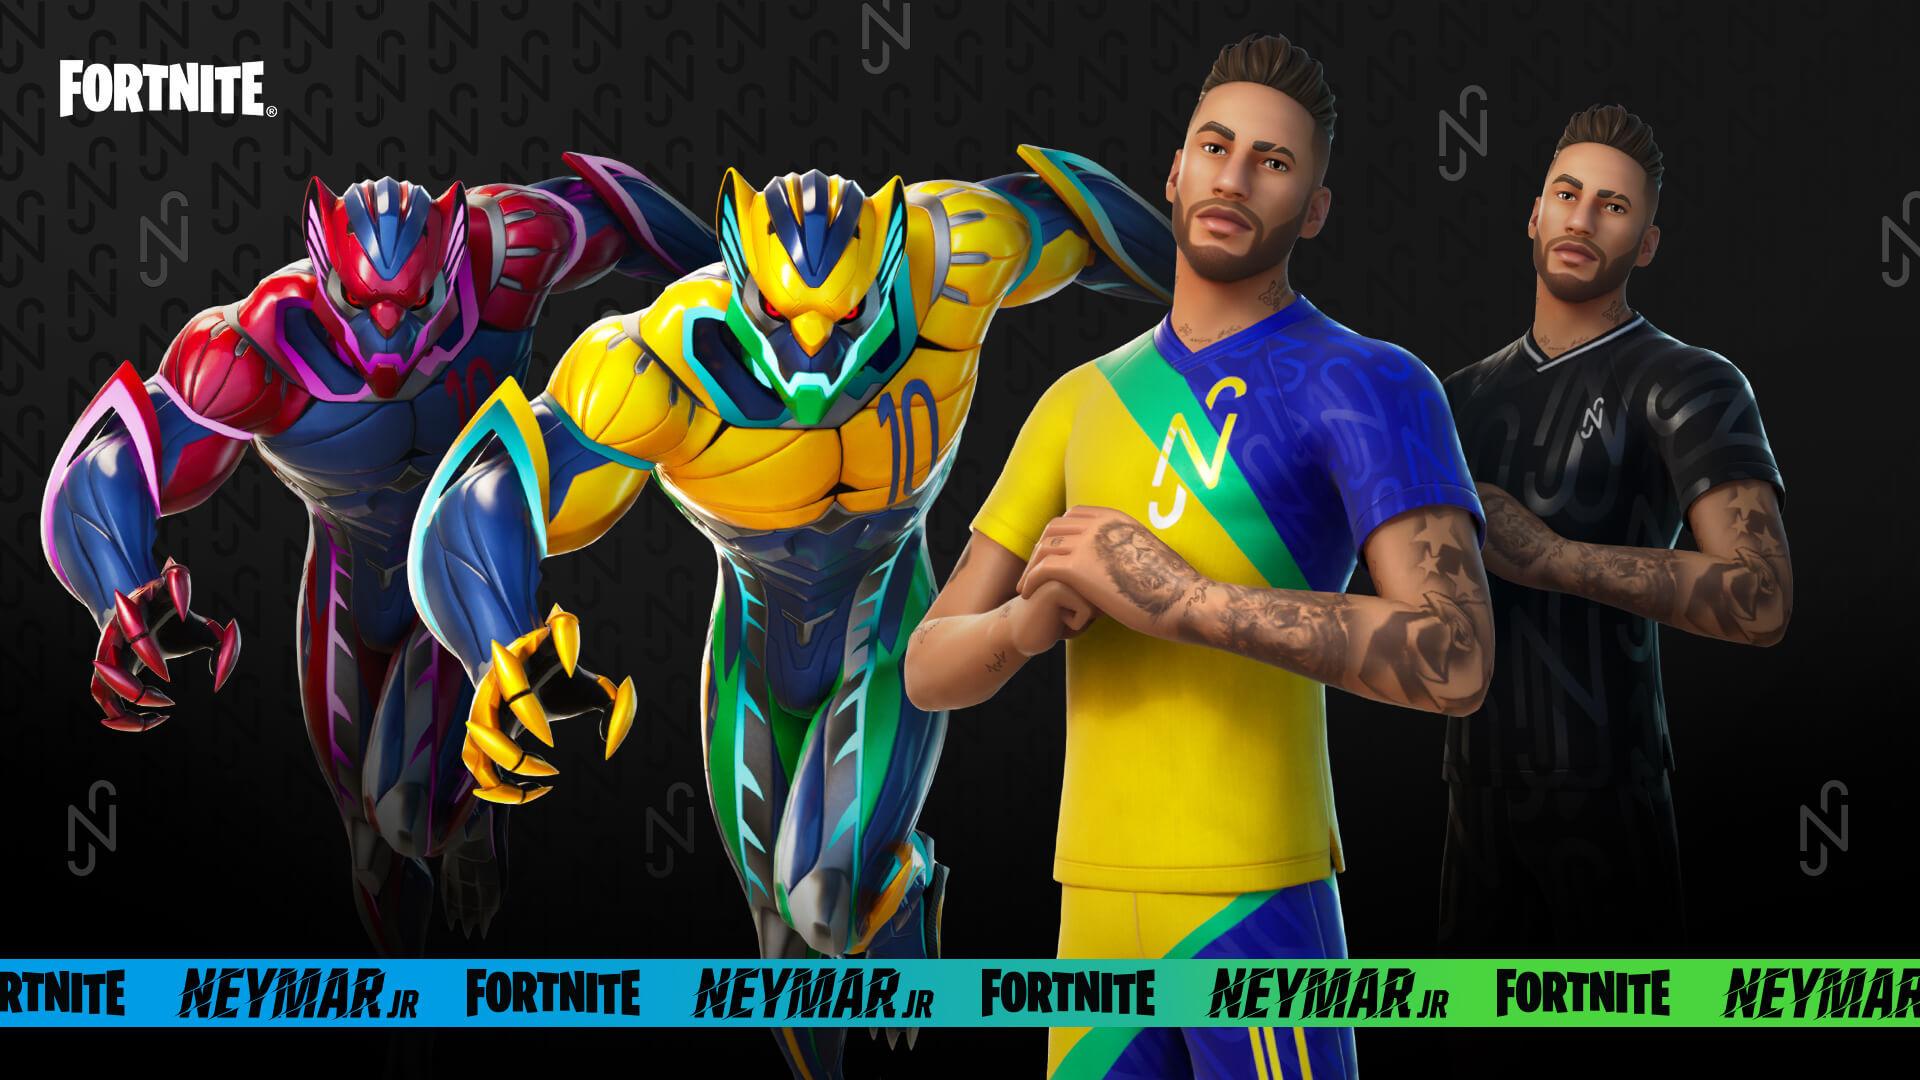 Las skins alternativas de Neymar